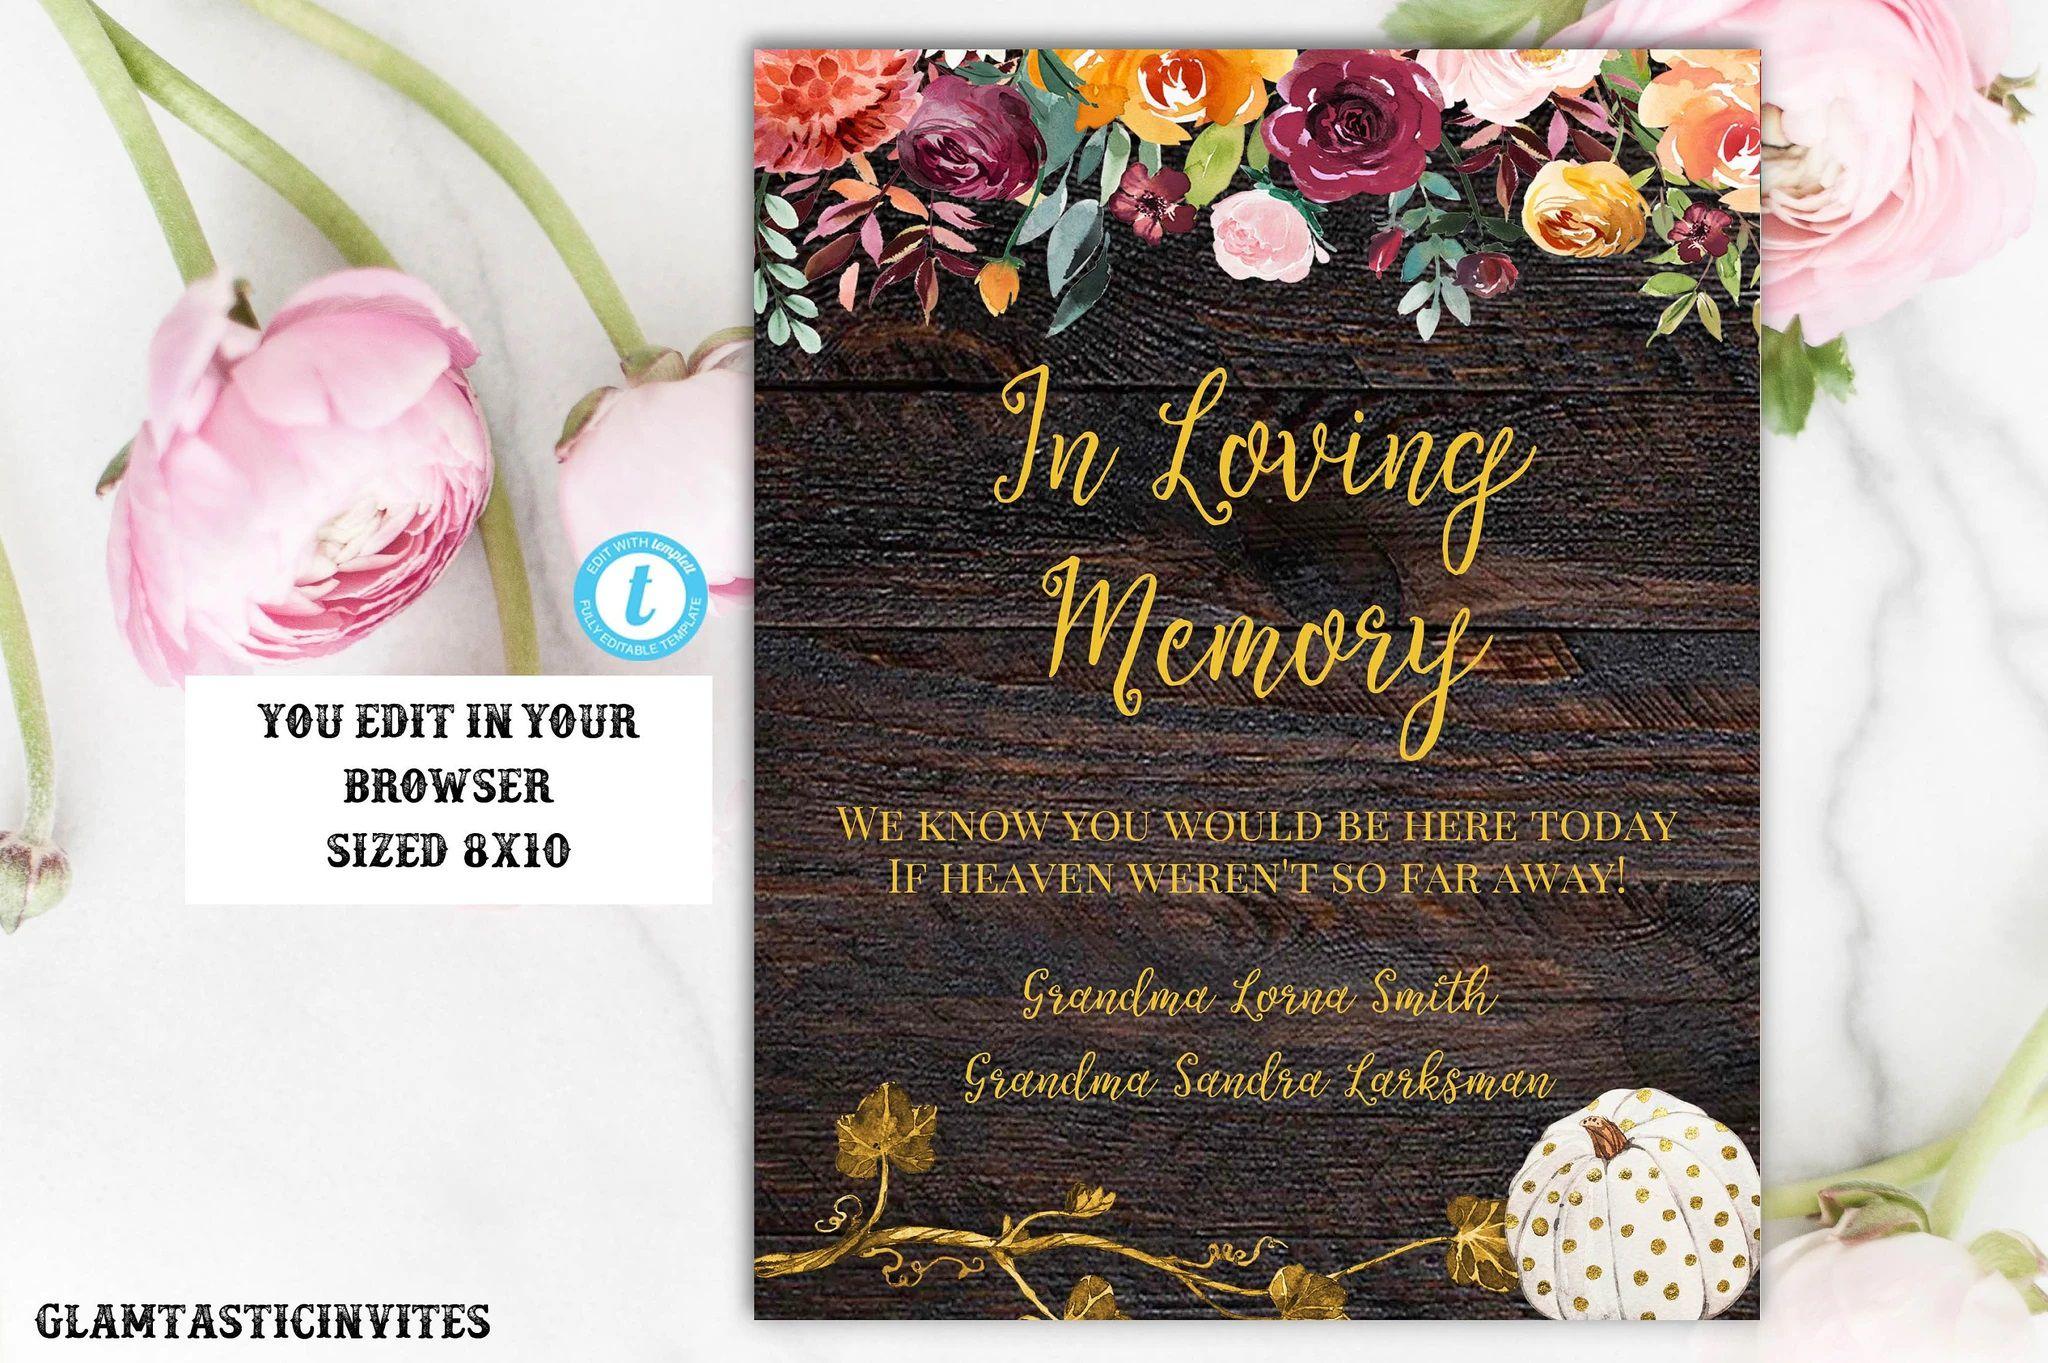 006 Simple In Loving Memory Template Image  Free Download Card BookmarkFull